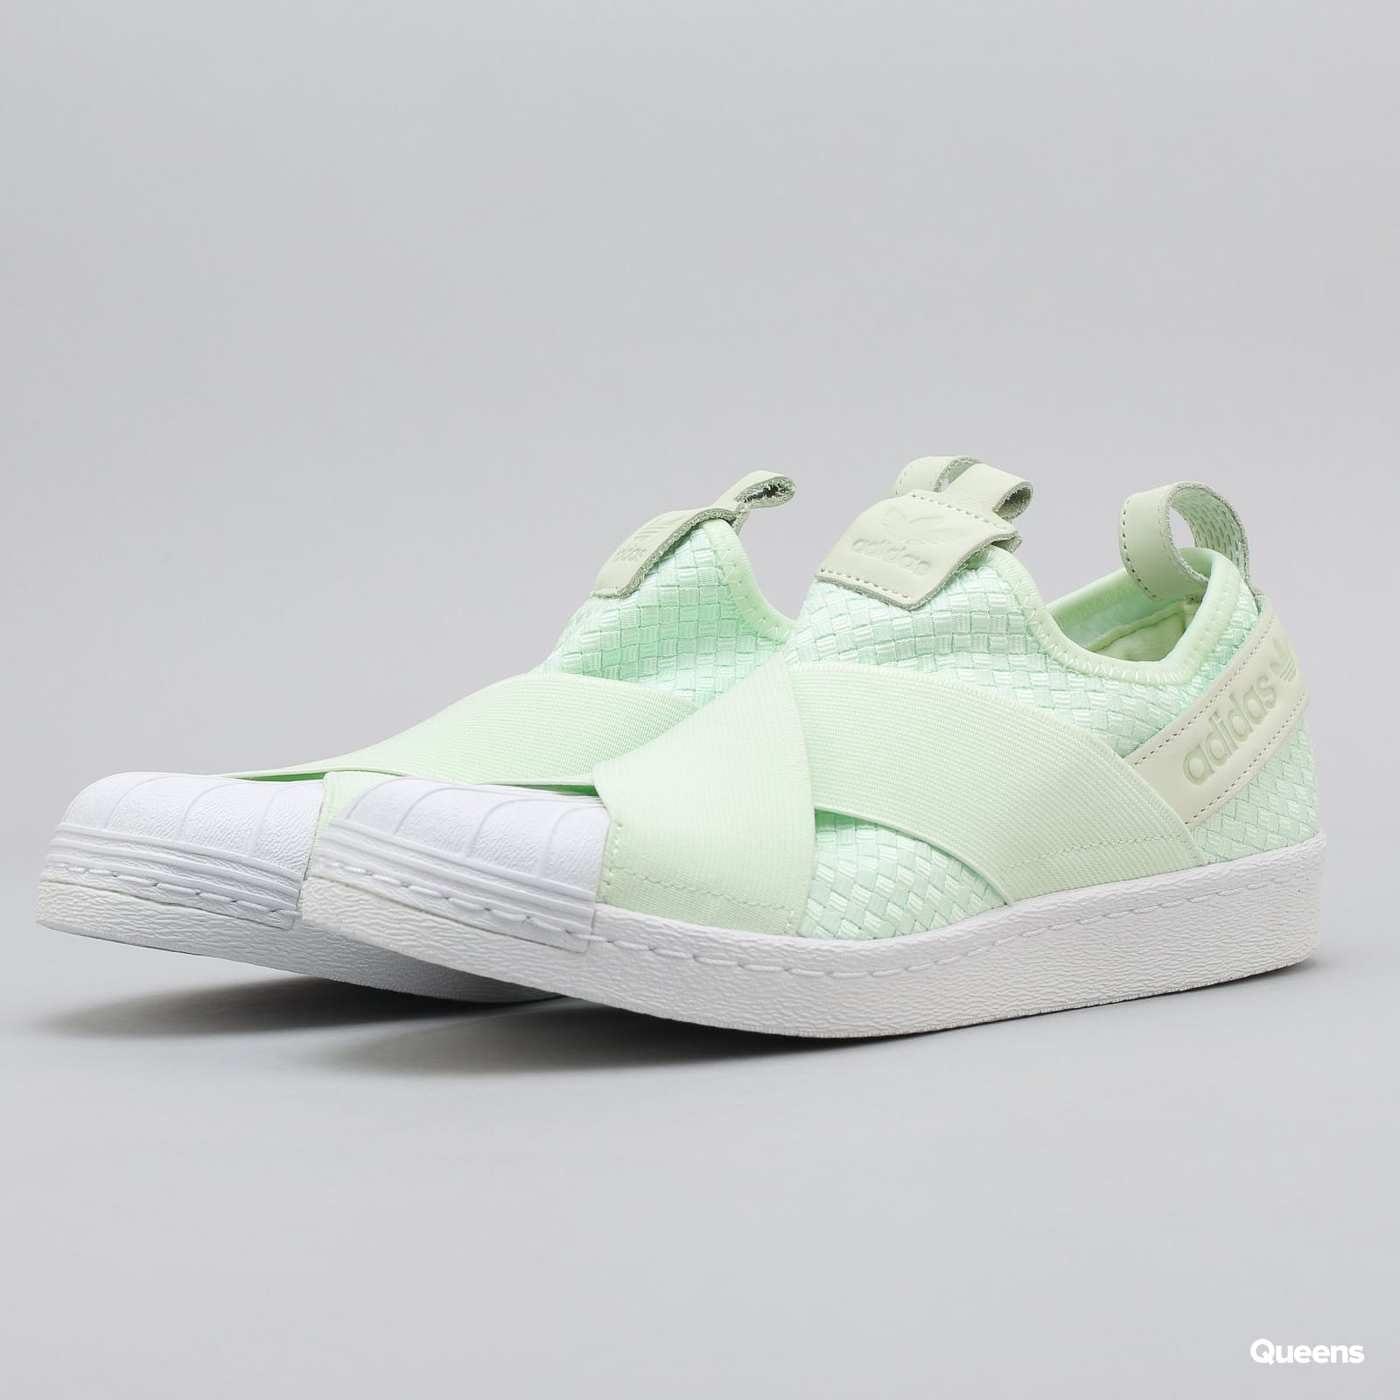 cba1ac10422 Boty adidas Superstar Slipon (CQ2488) – Queens 💚